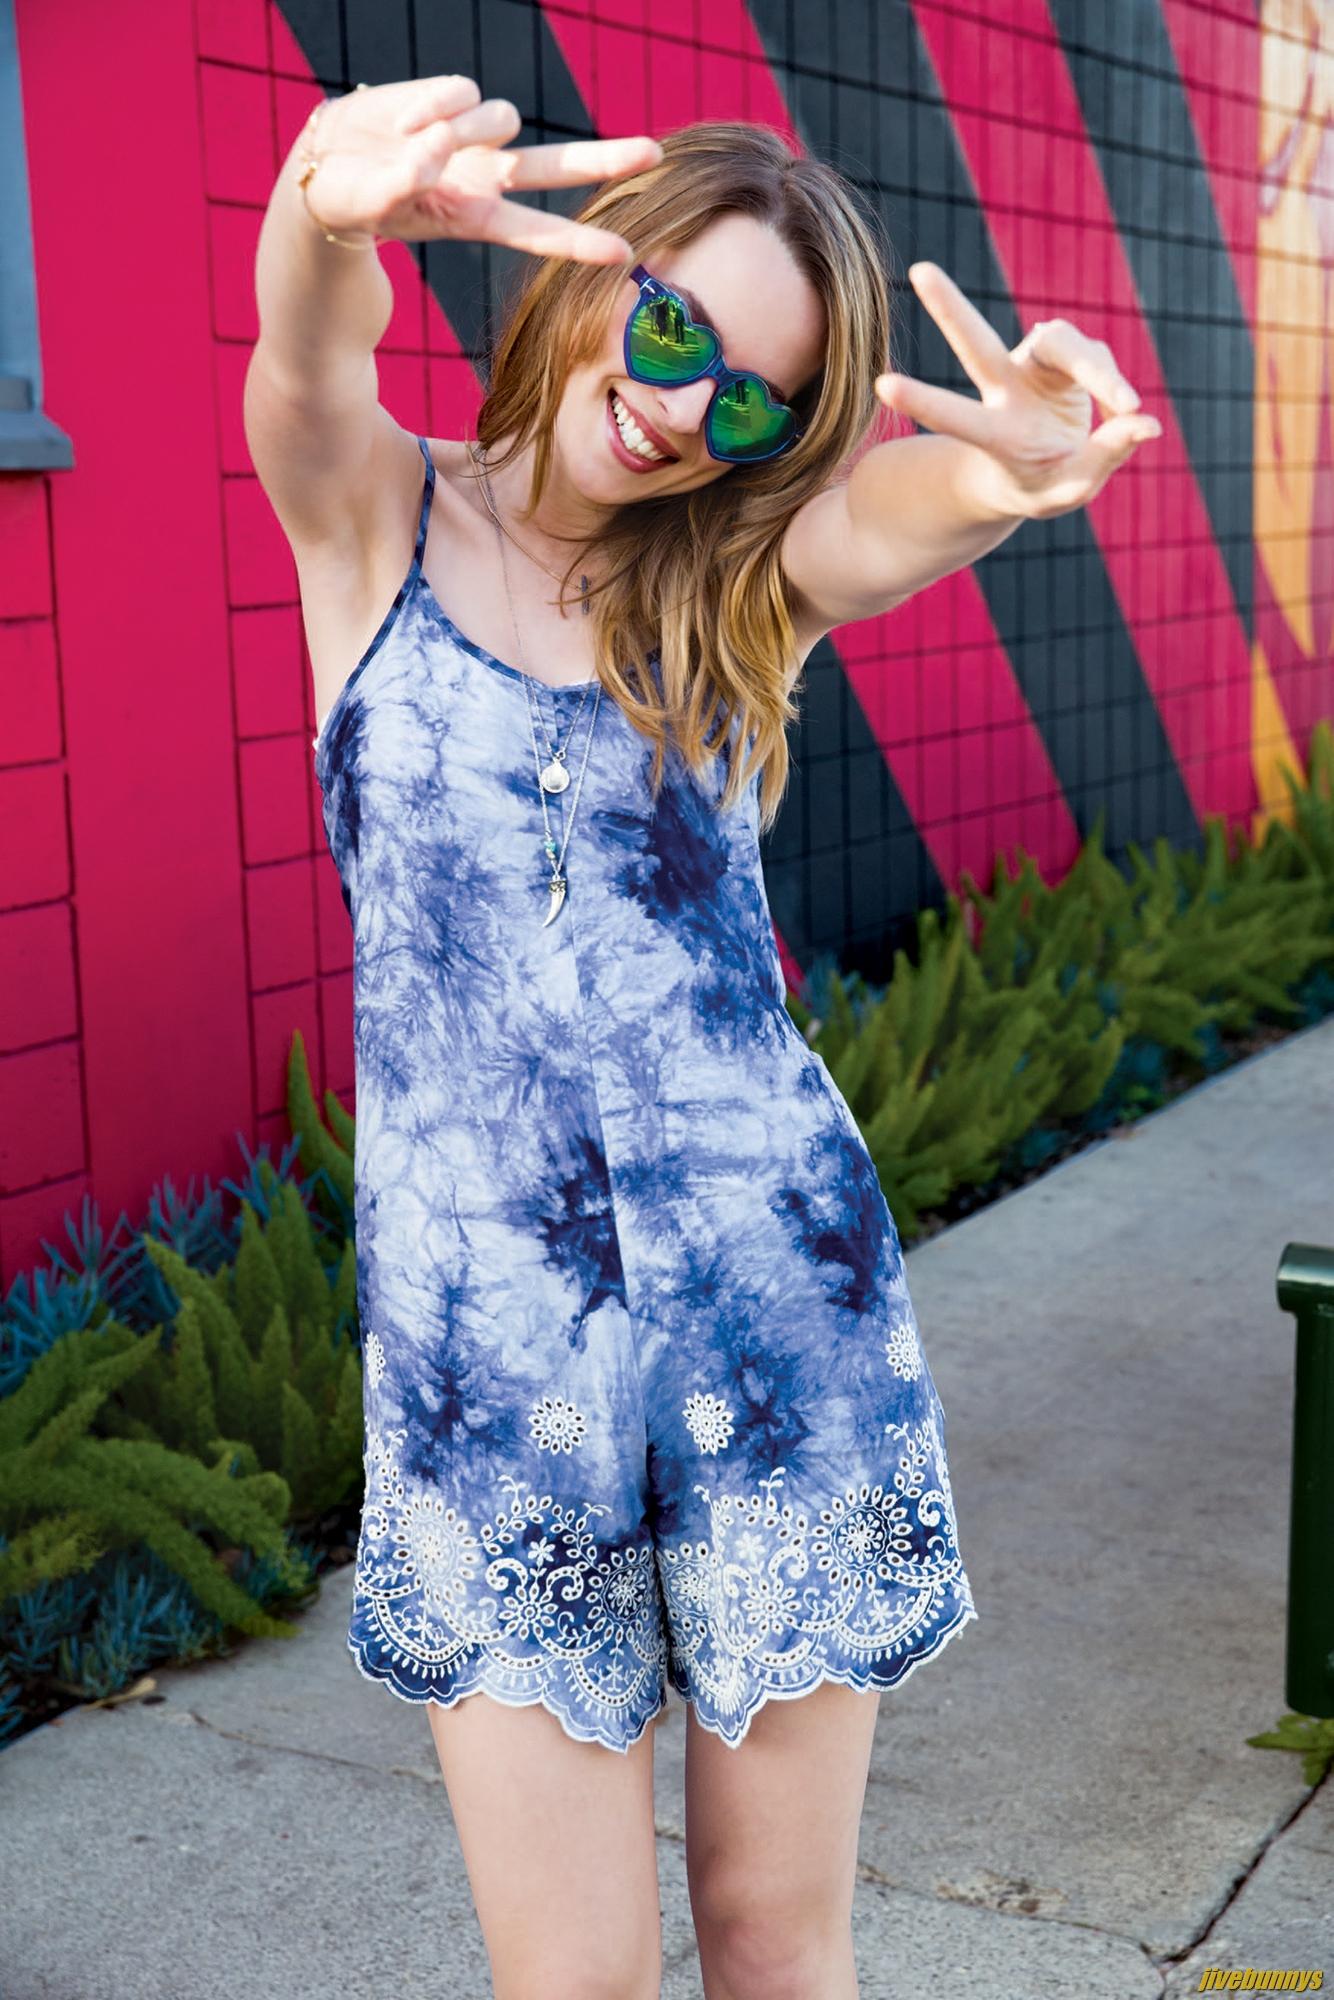 Jivebunnys Female Celebrity Picture Gallery: Bridgit ... Jessica Alba Instagram